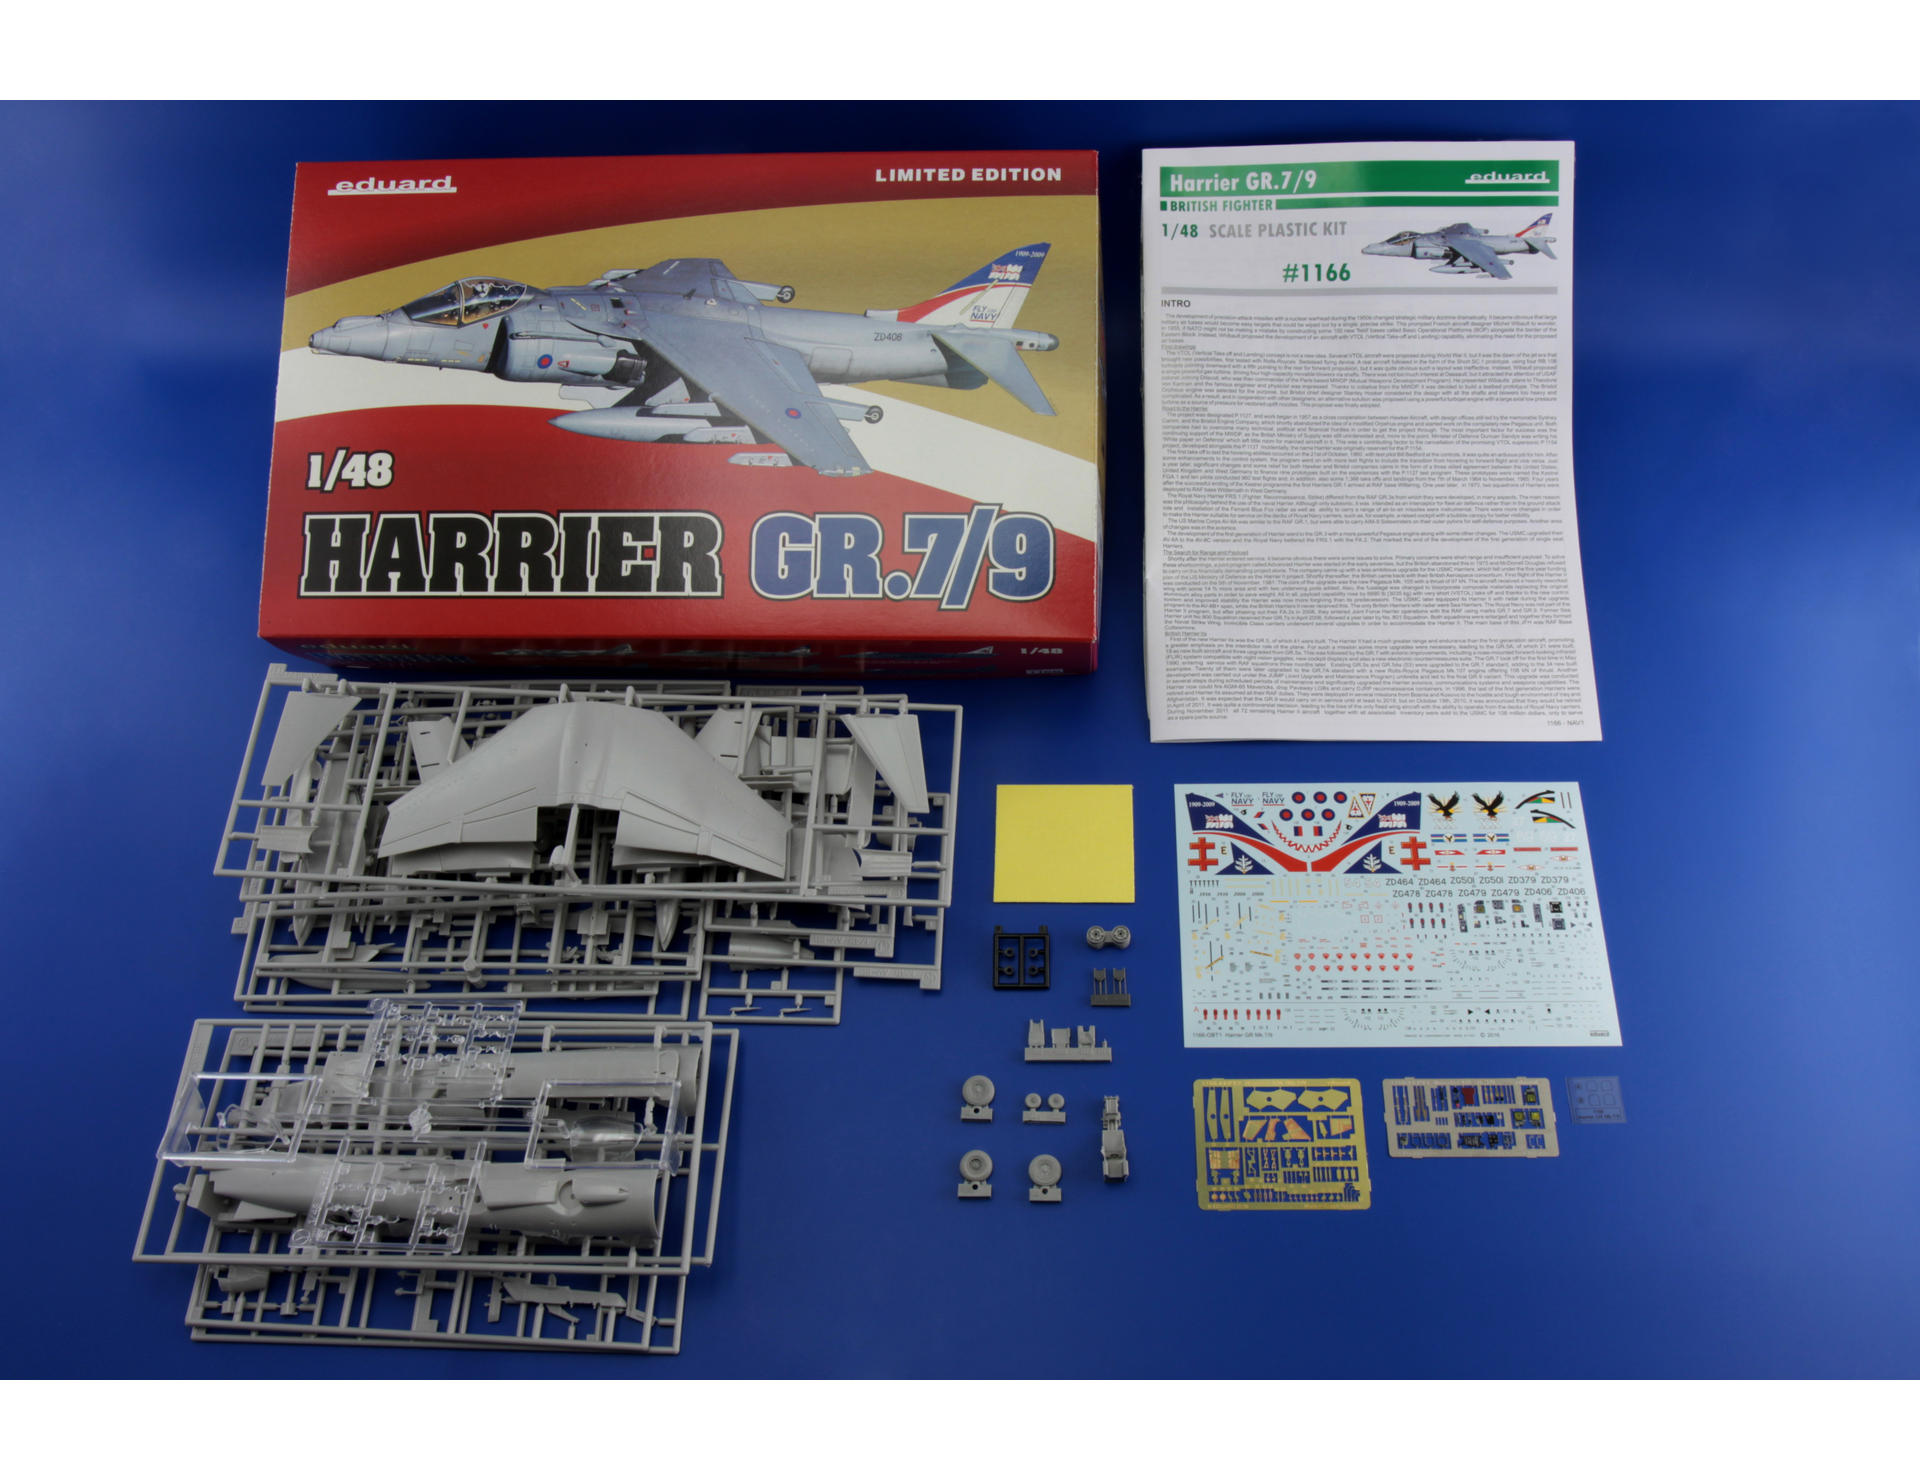 1166-harrier-01